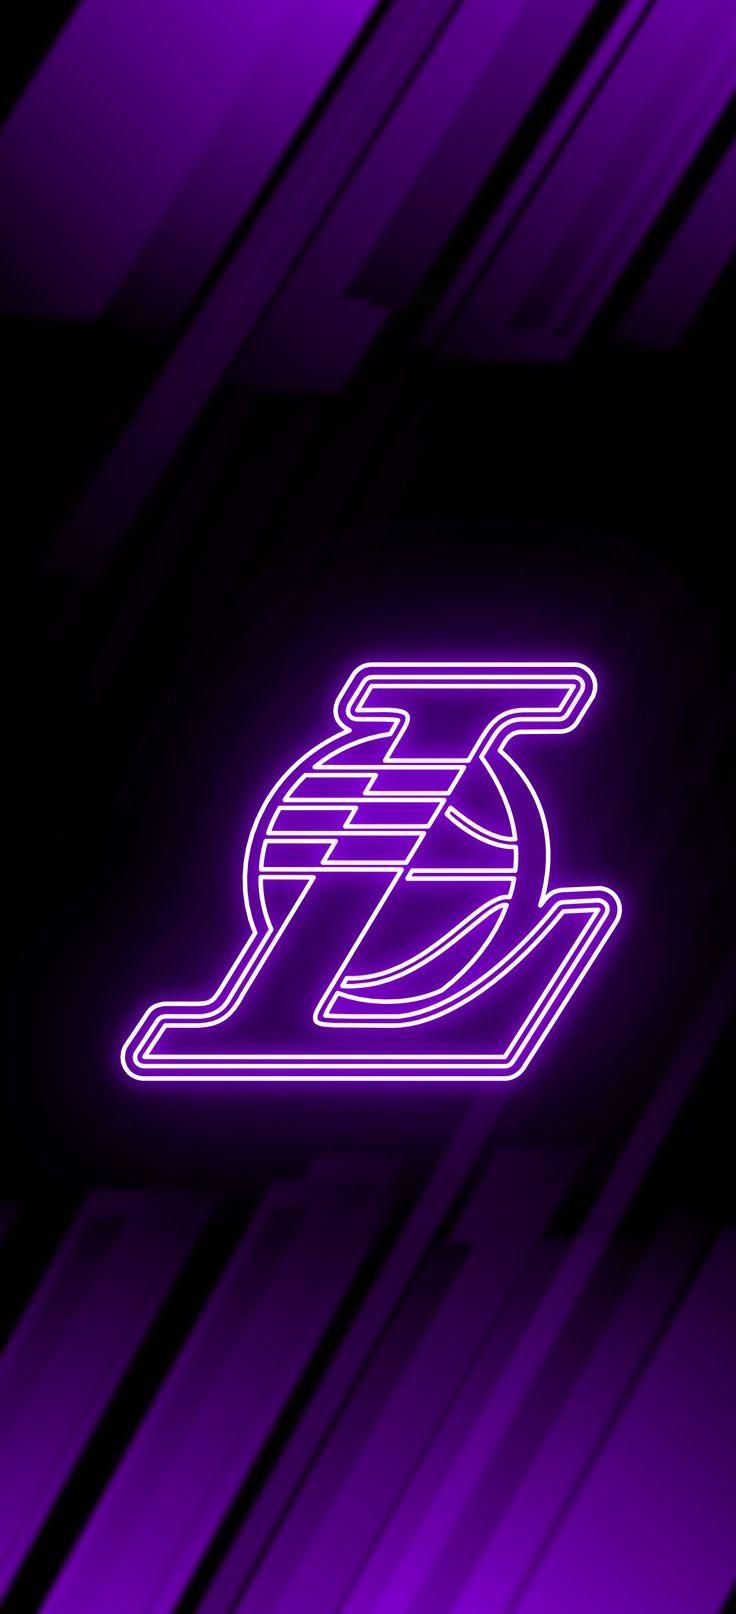 Los Angeles Lakers Neon Wallpaper Nba Basketball Art Lakers Wallpaper Lakers Basketball